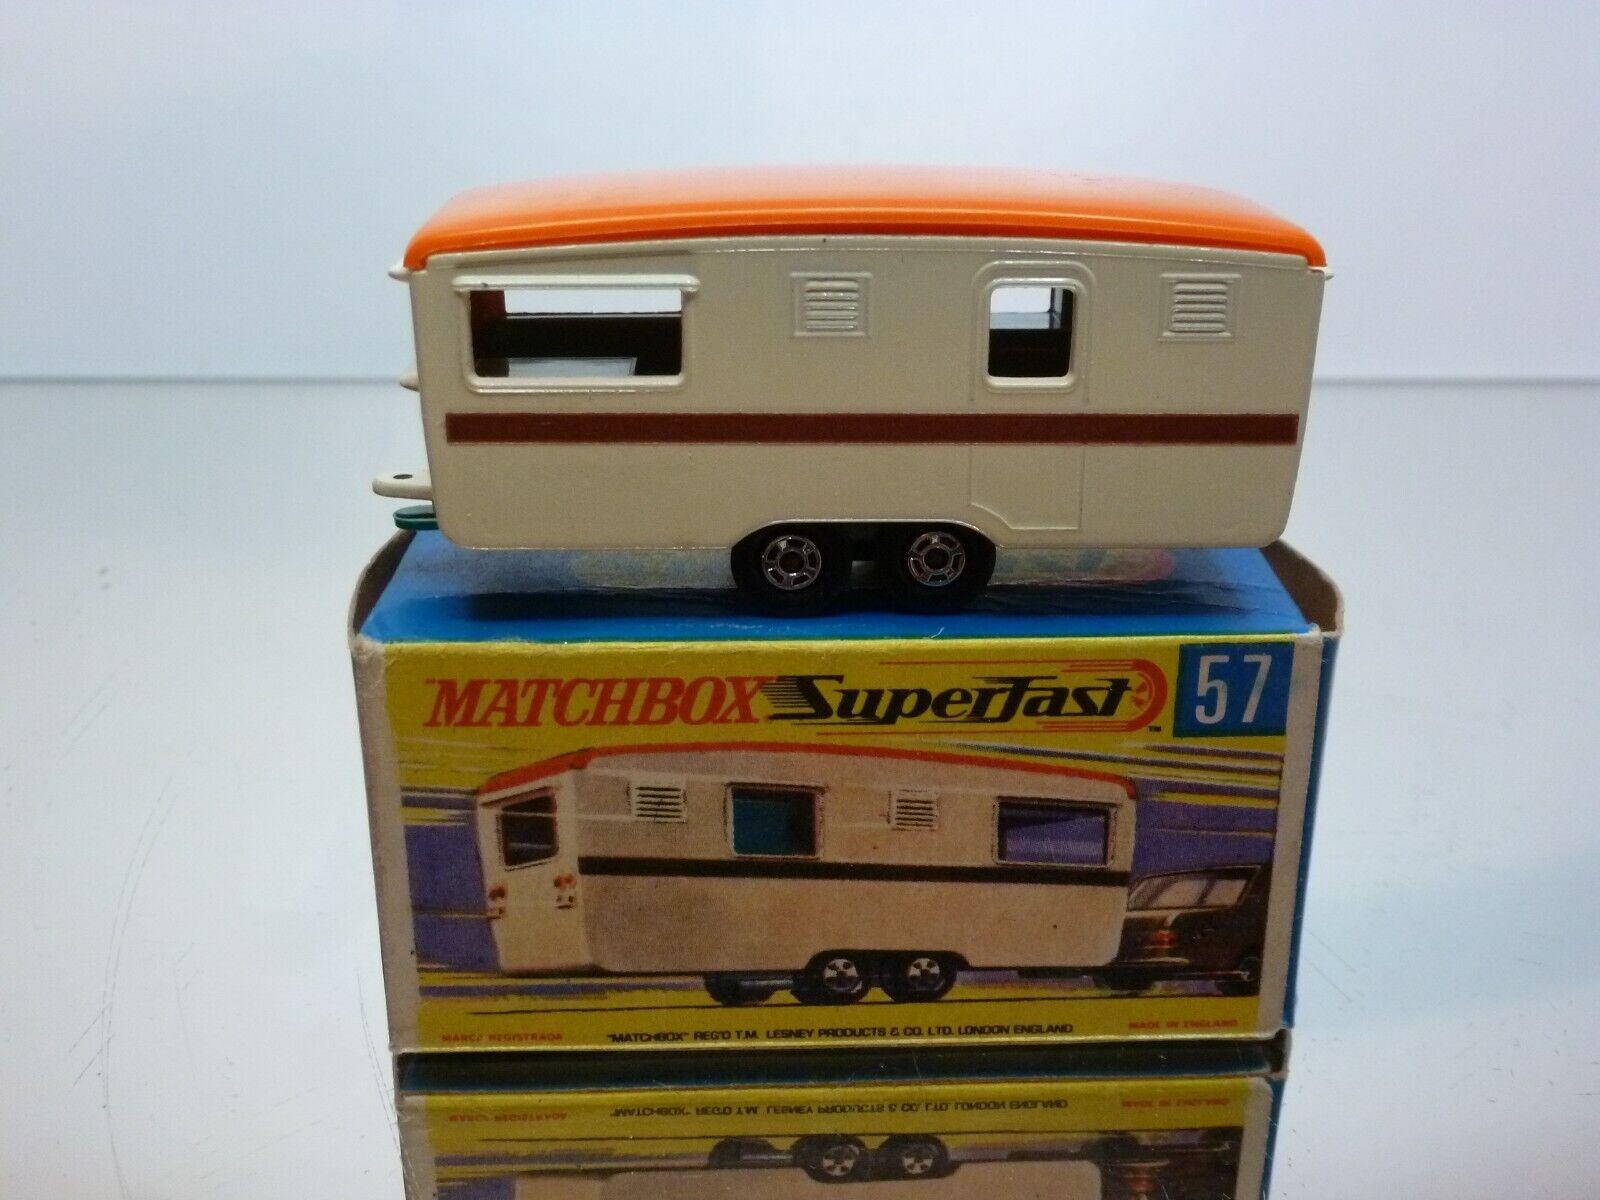 MATCHBOX SUPERFAST 57 TRAILER CARAVAN - CREAM + orange - EXCELLENT IN BOX